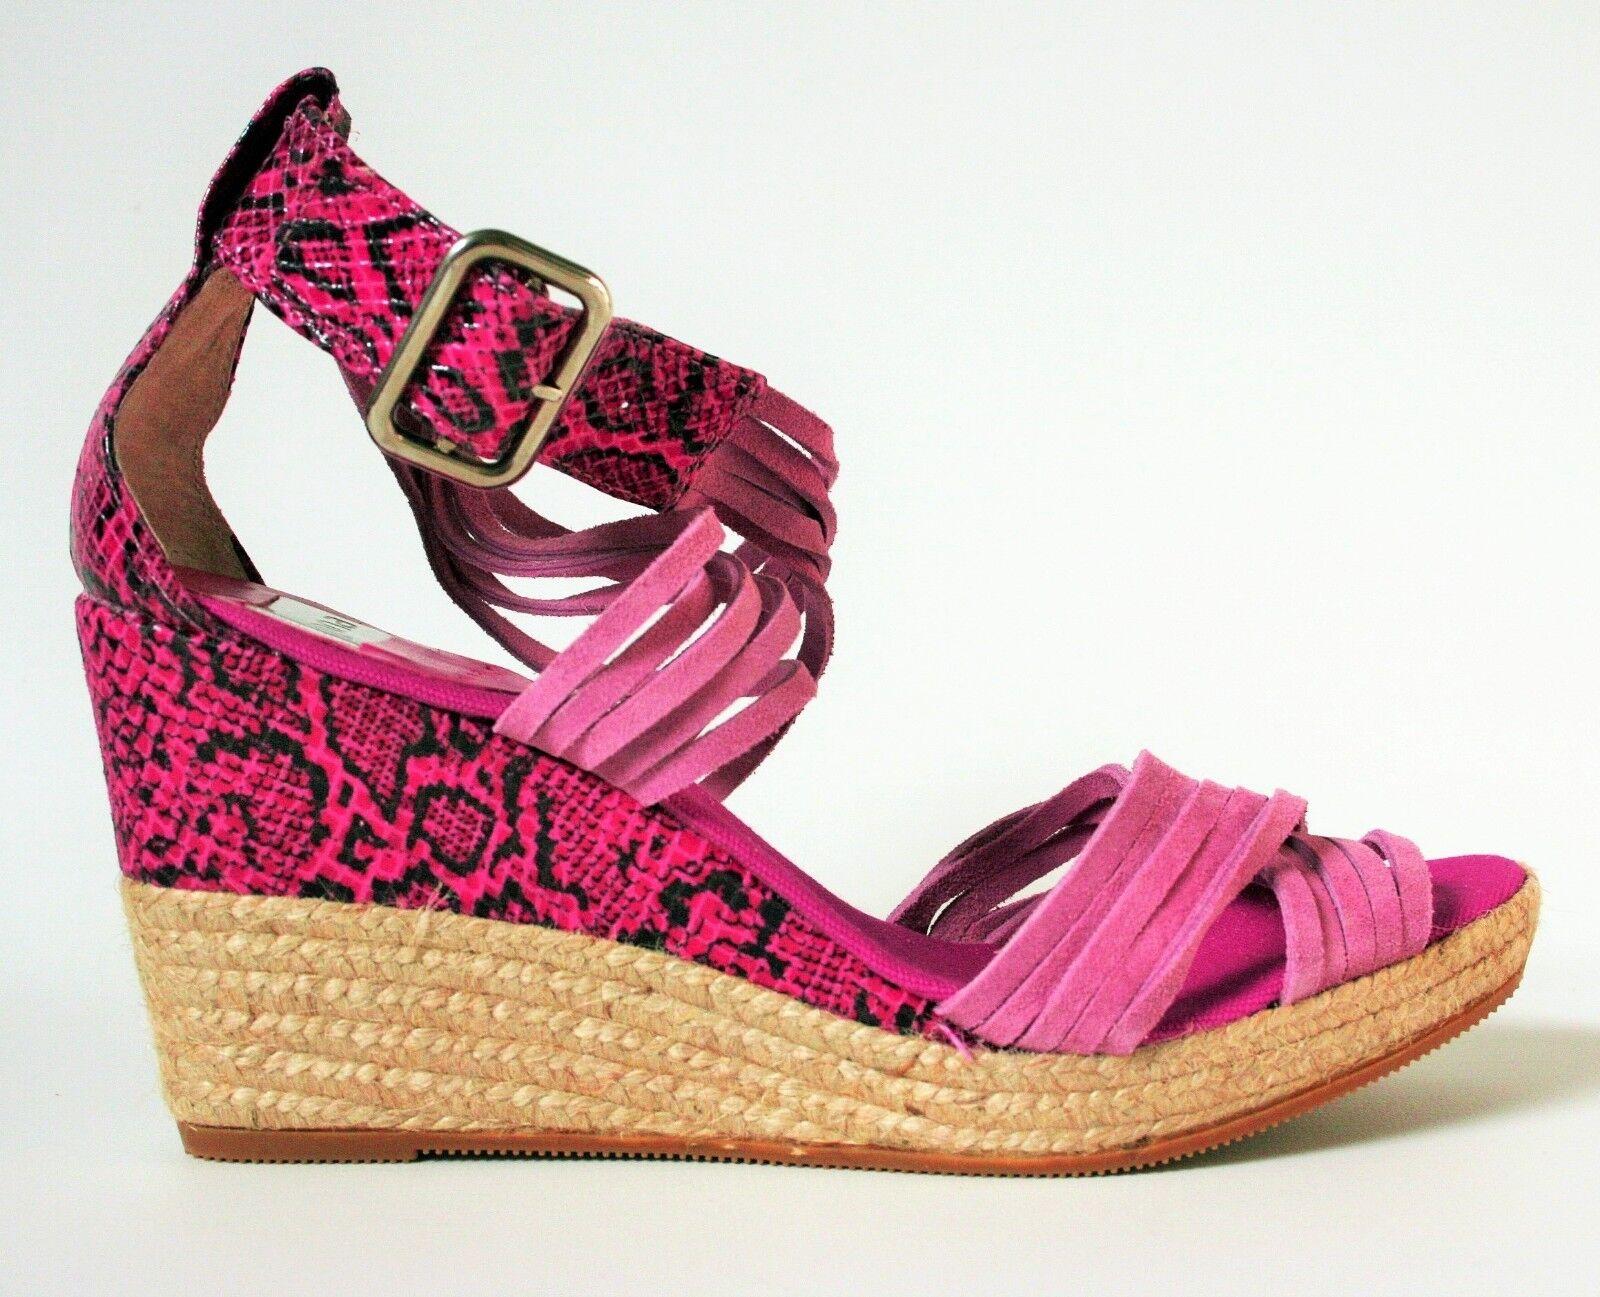 Women's KANNA Pink Suede Wedge Espadrilles Sandals High Heels shoes SIZE UK 7